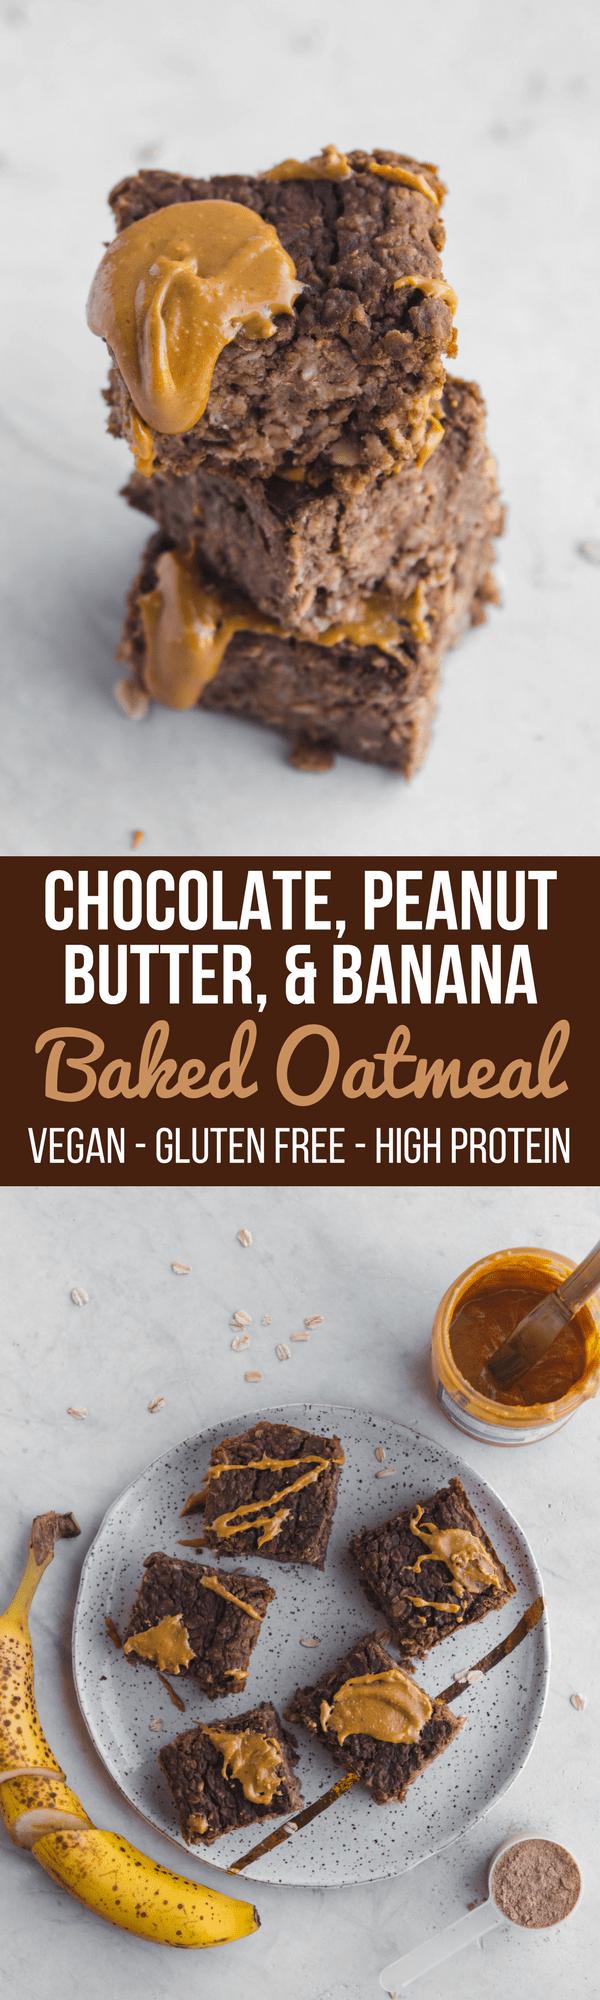 Chocolate, Peanut Butter & Banana Baked Oatmeal - High Protein Vegan Breakfast Recipe #vegan #mealprep #oatmeal #plantbased #glutenfree